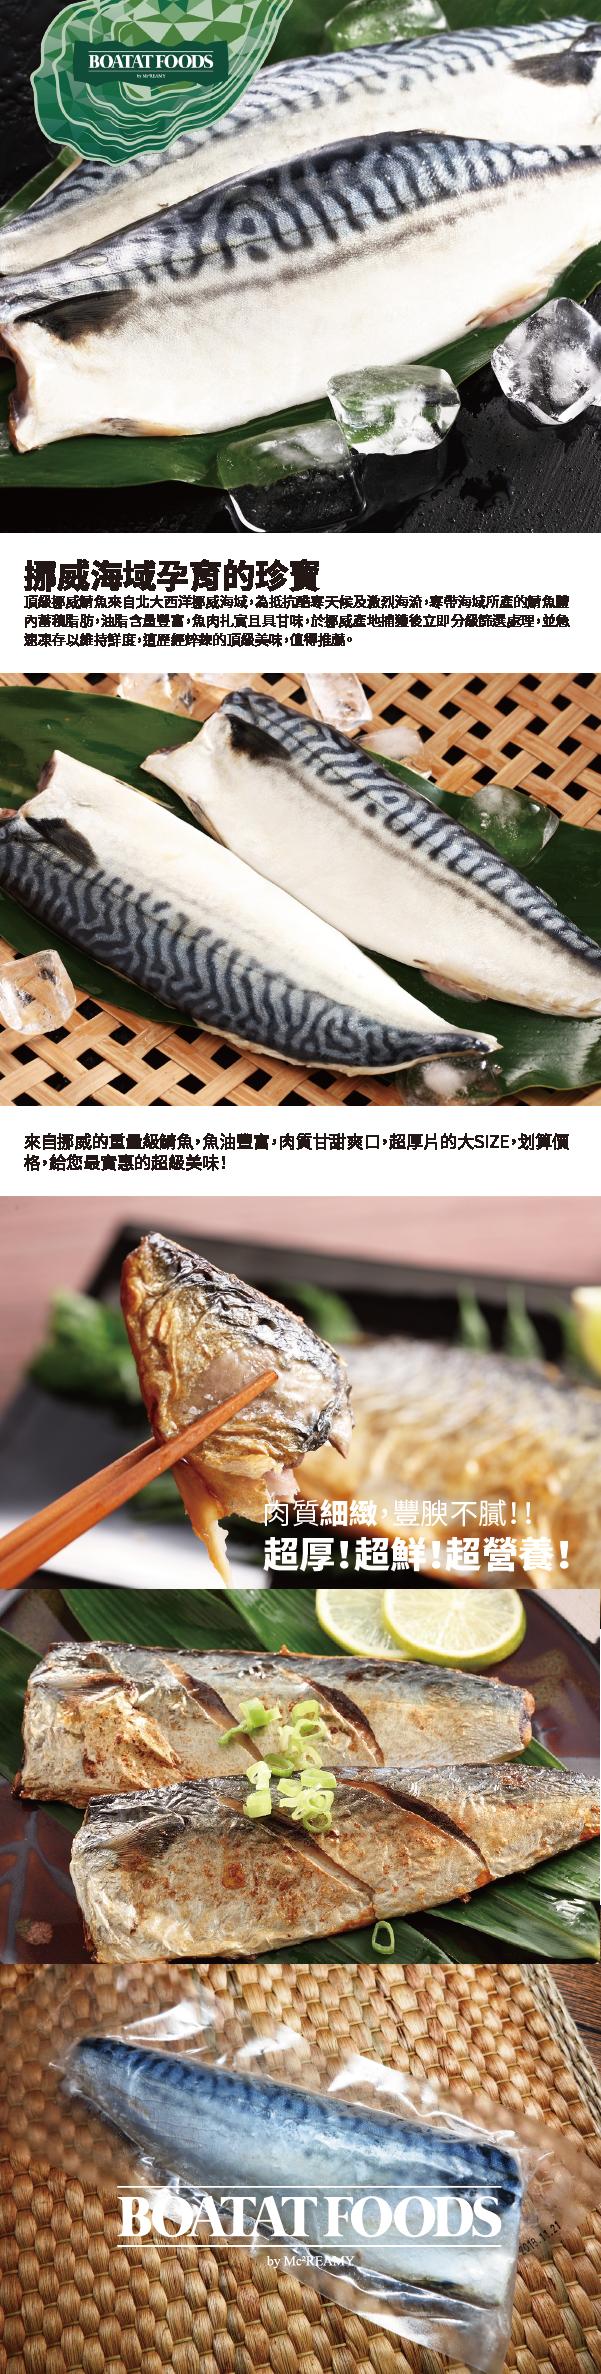 mackerel-01.png